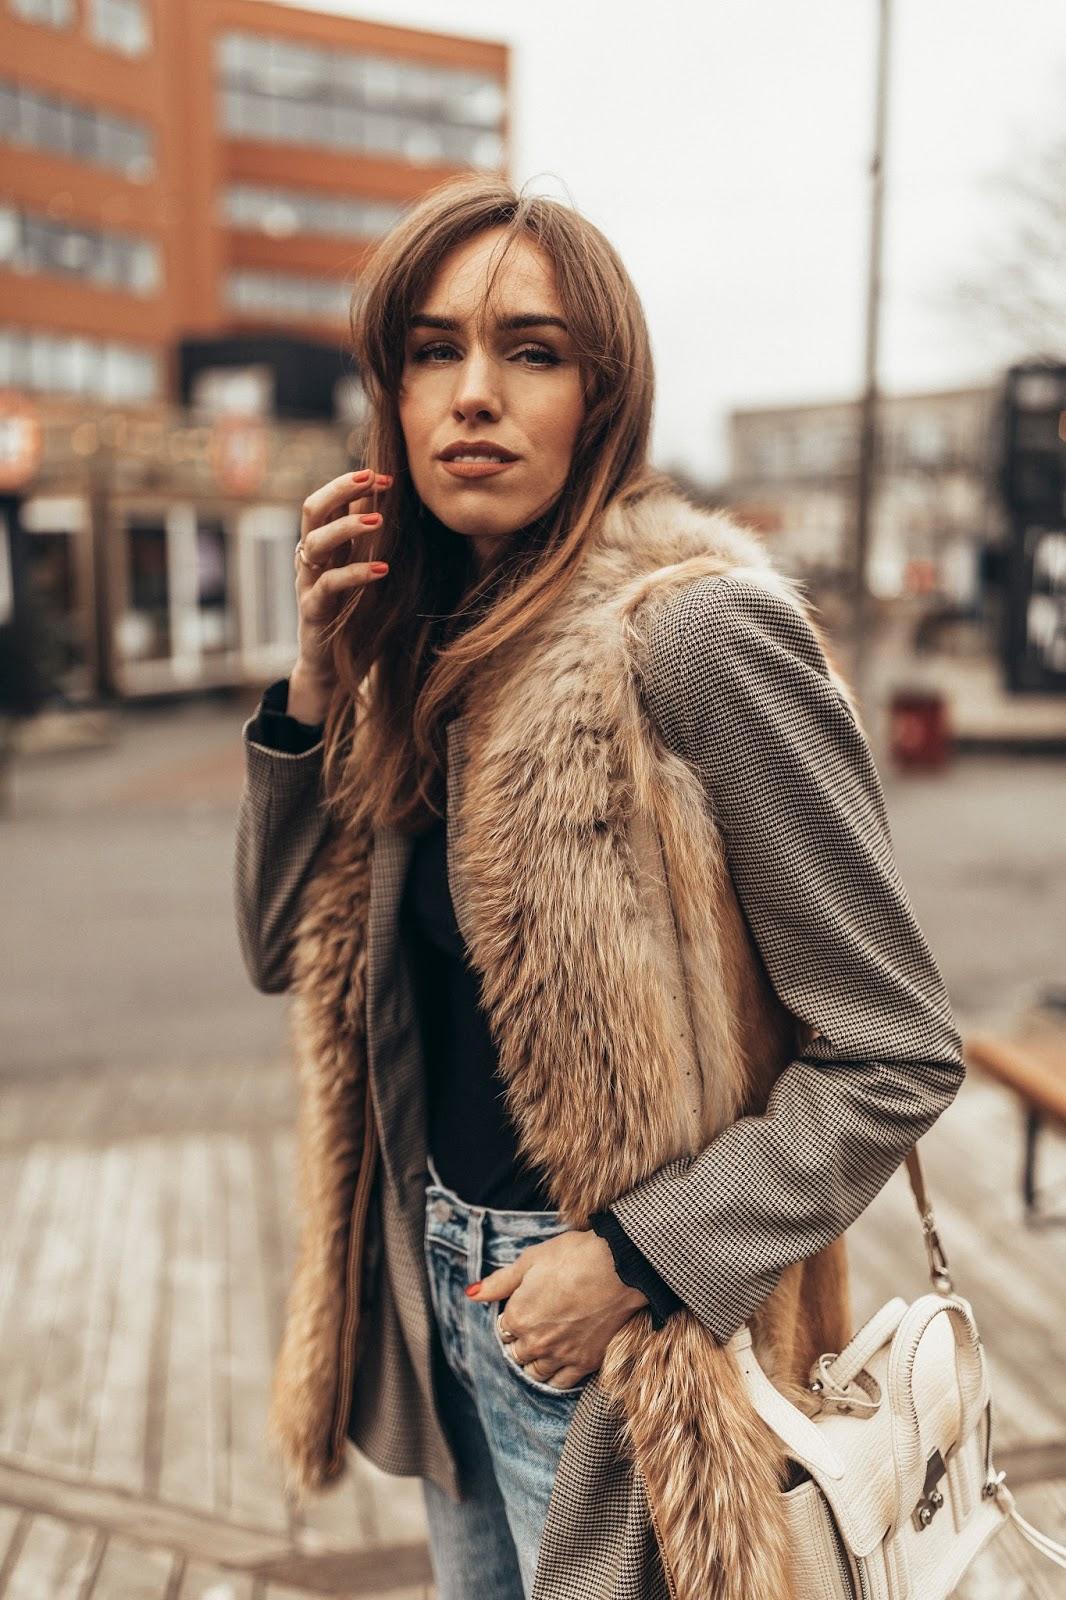 fur vest over blazer outfit